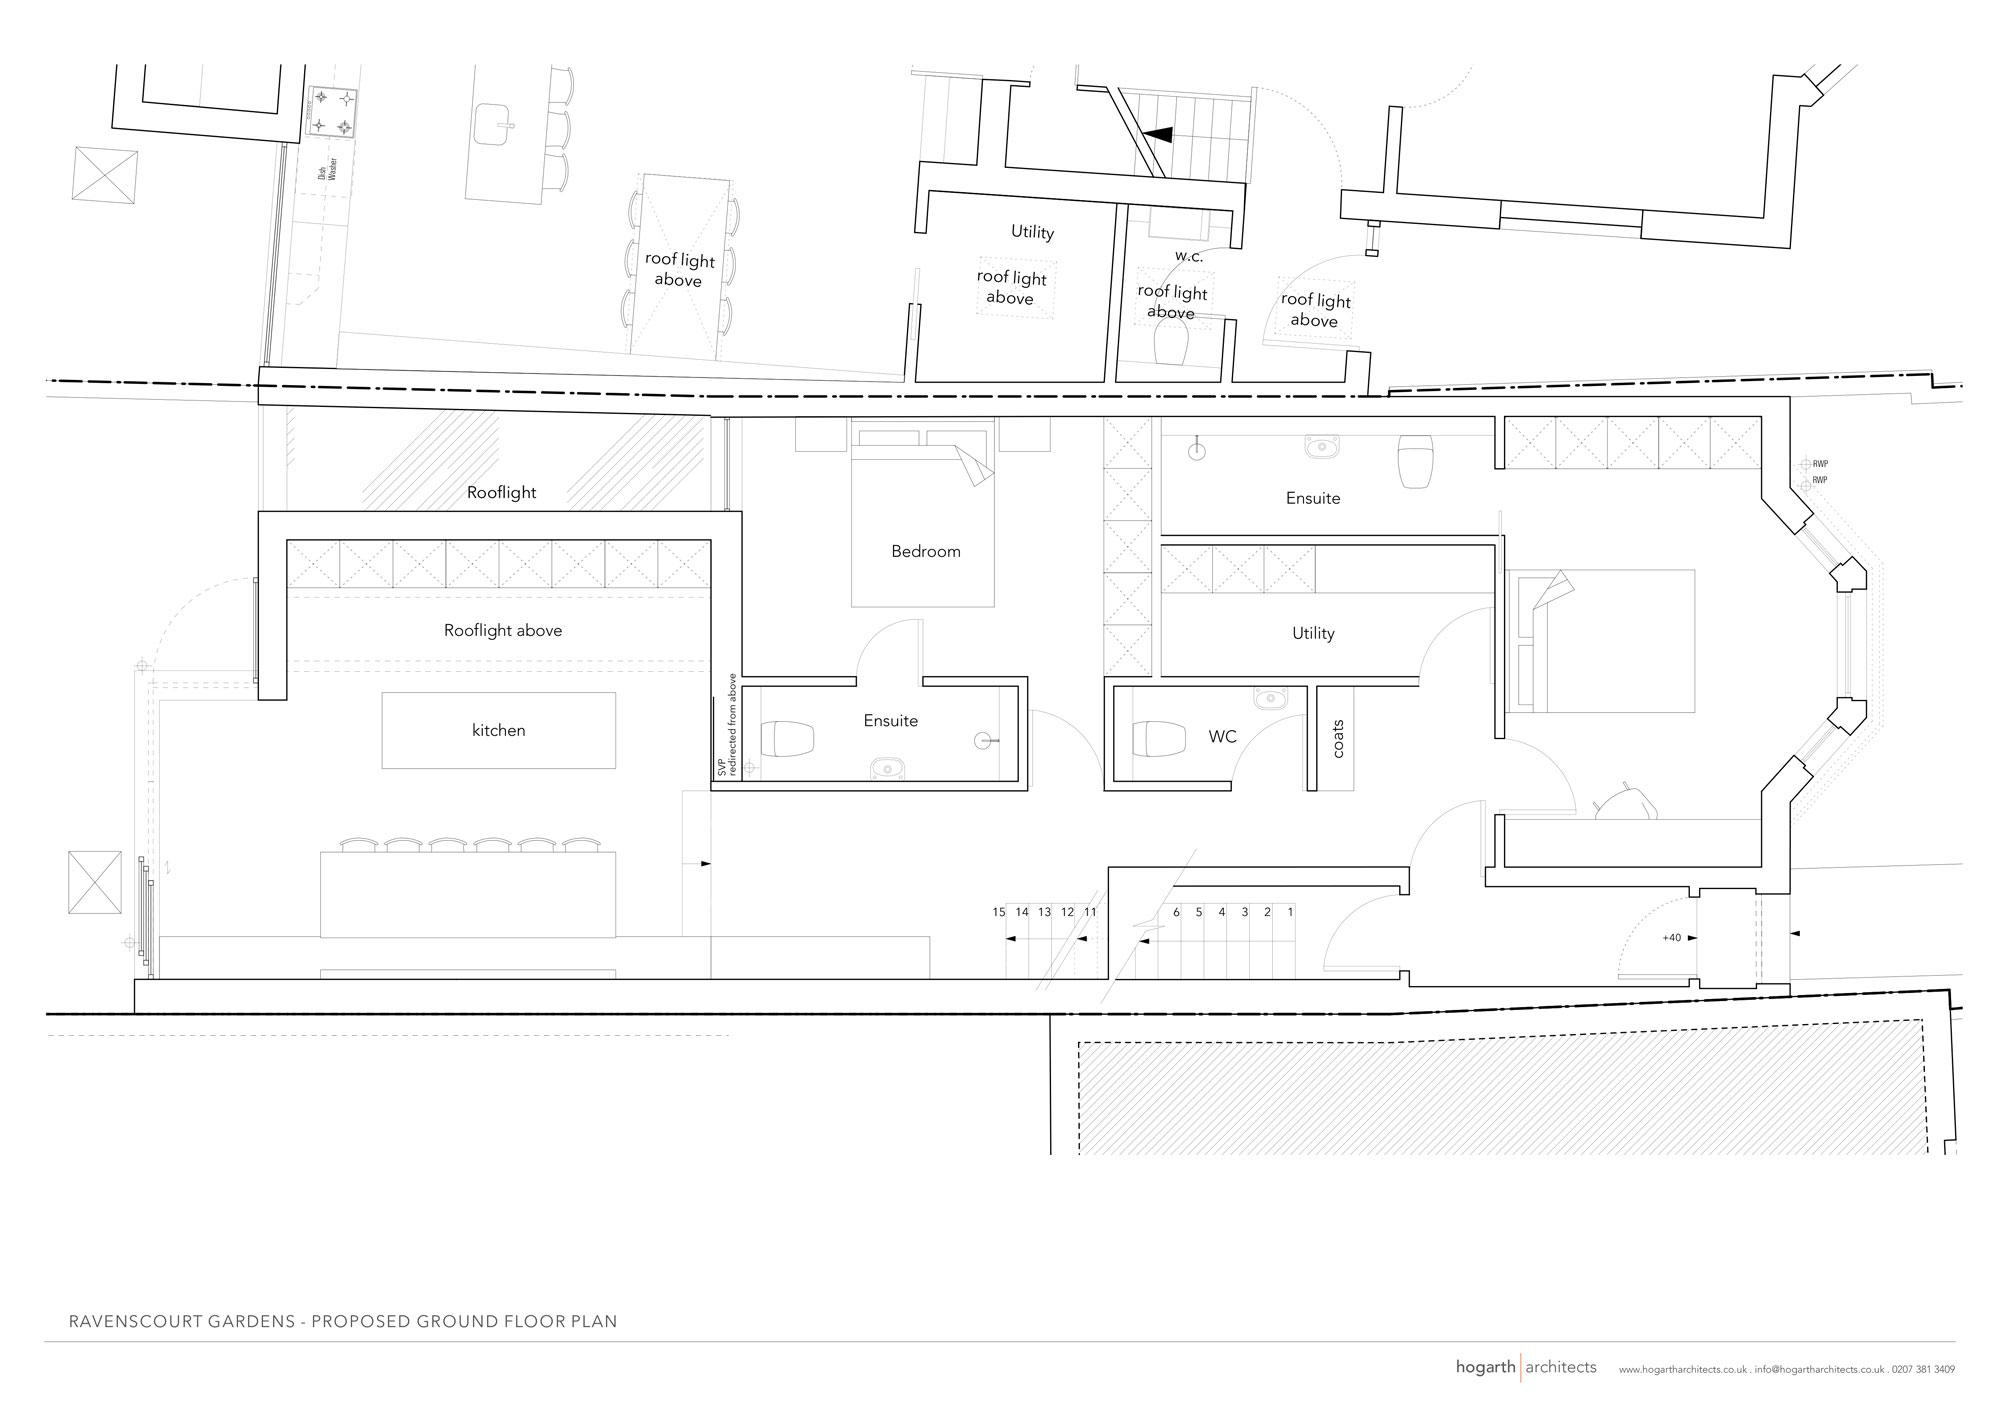 L(-2)371 Proposed Ground Floor Plan.jpg